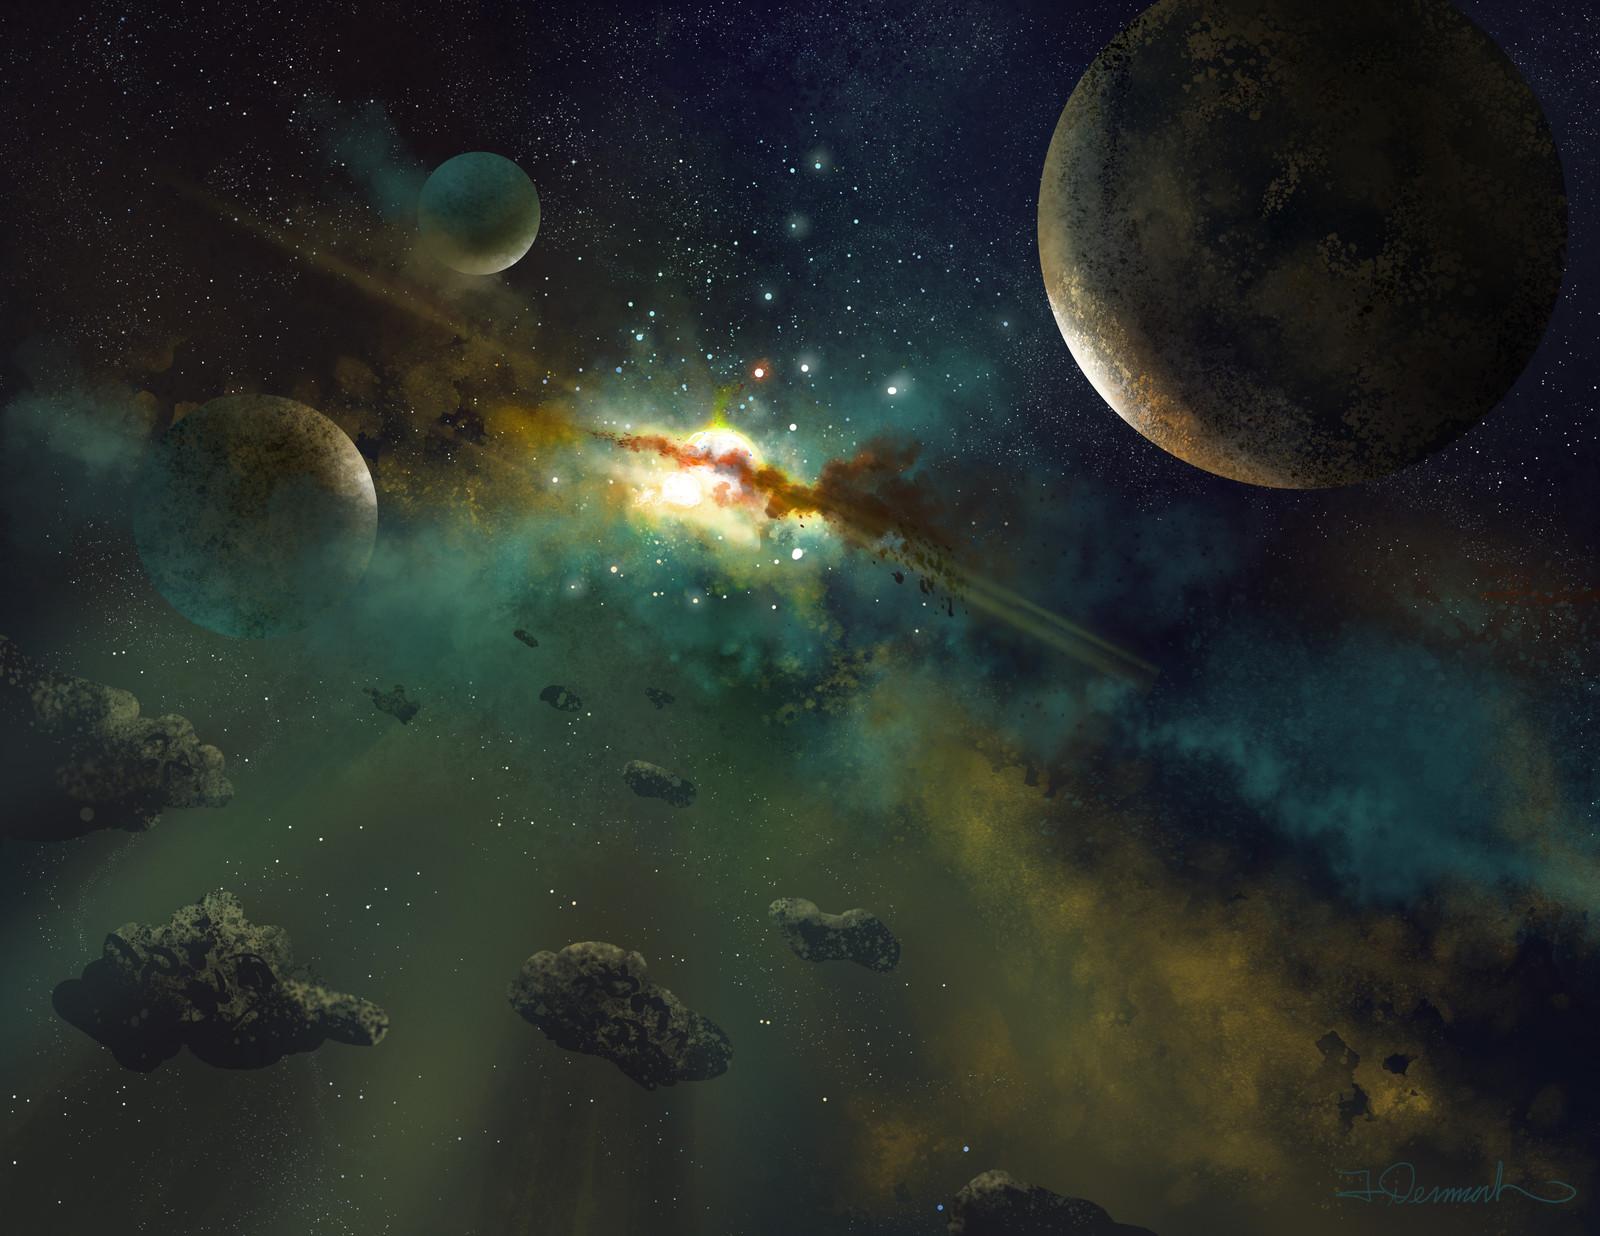 Star nursery in the Gemina cluster